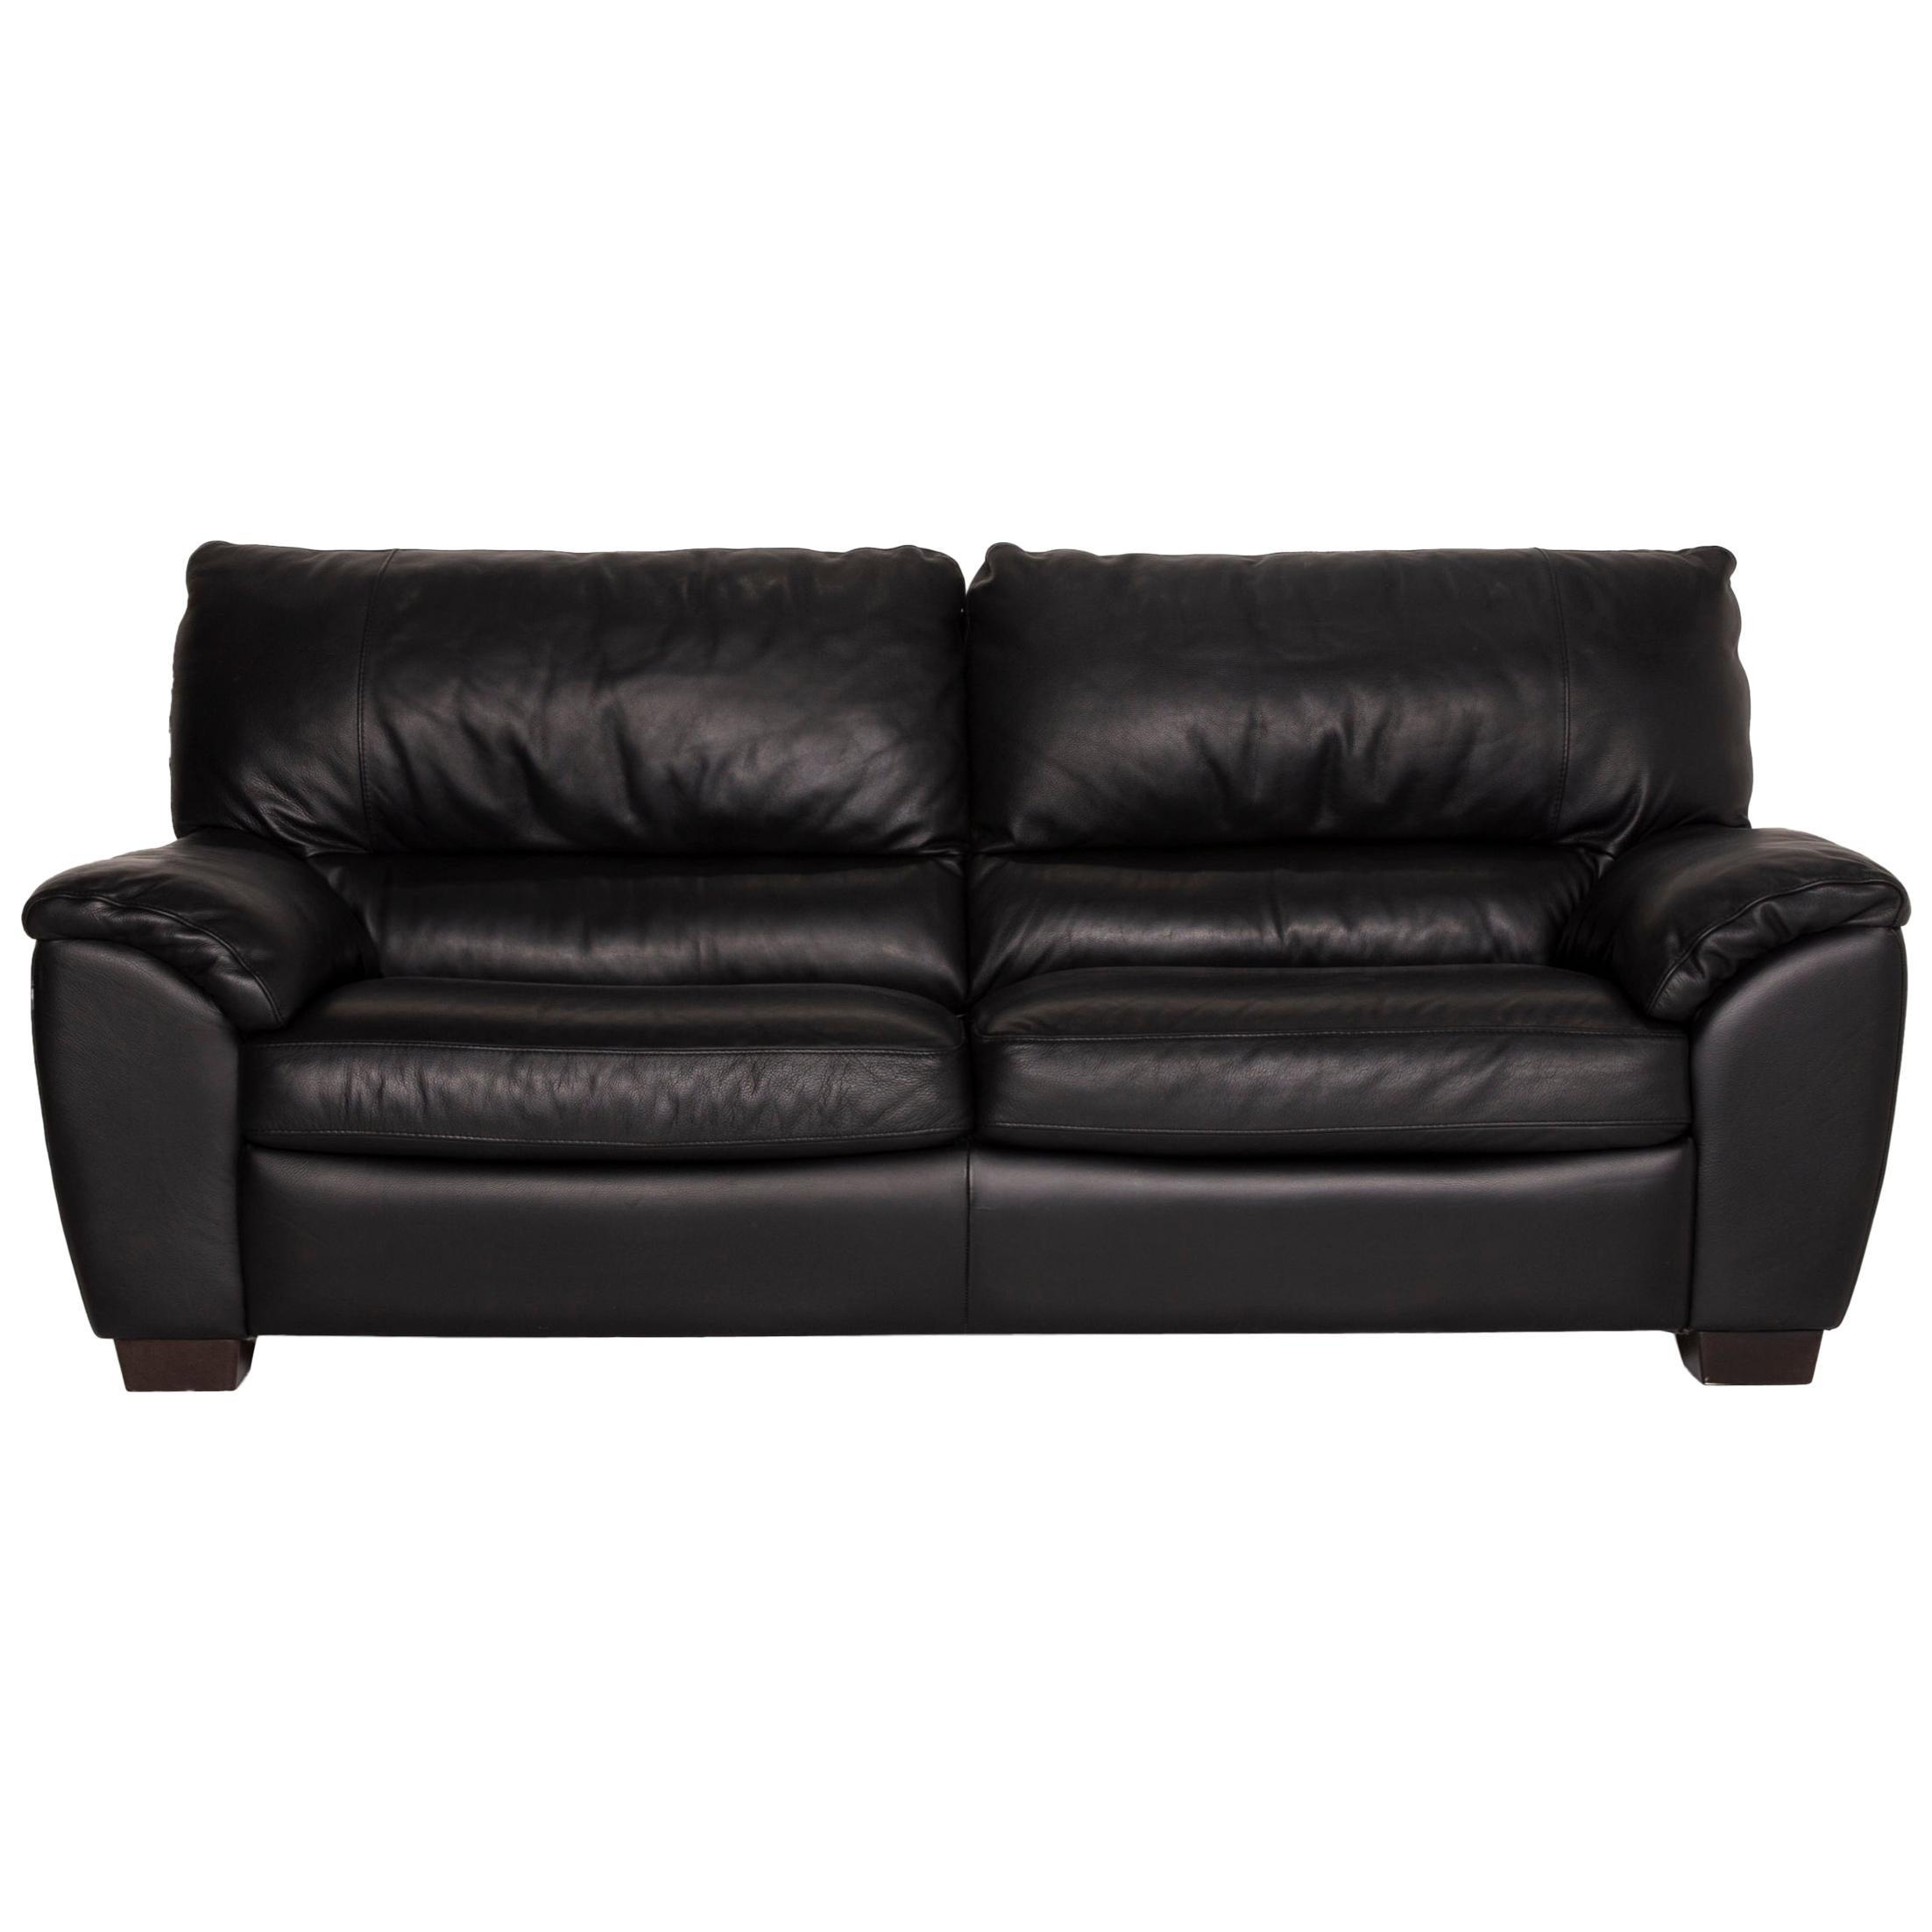 Natuzzi Two-Seater Leather Sofa Black